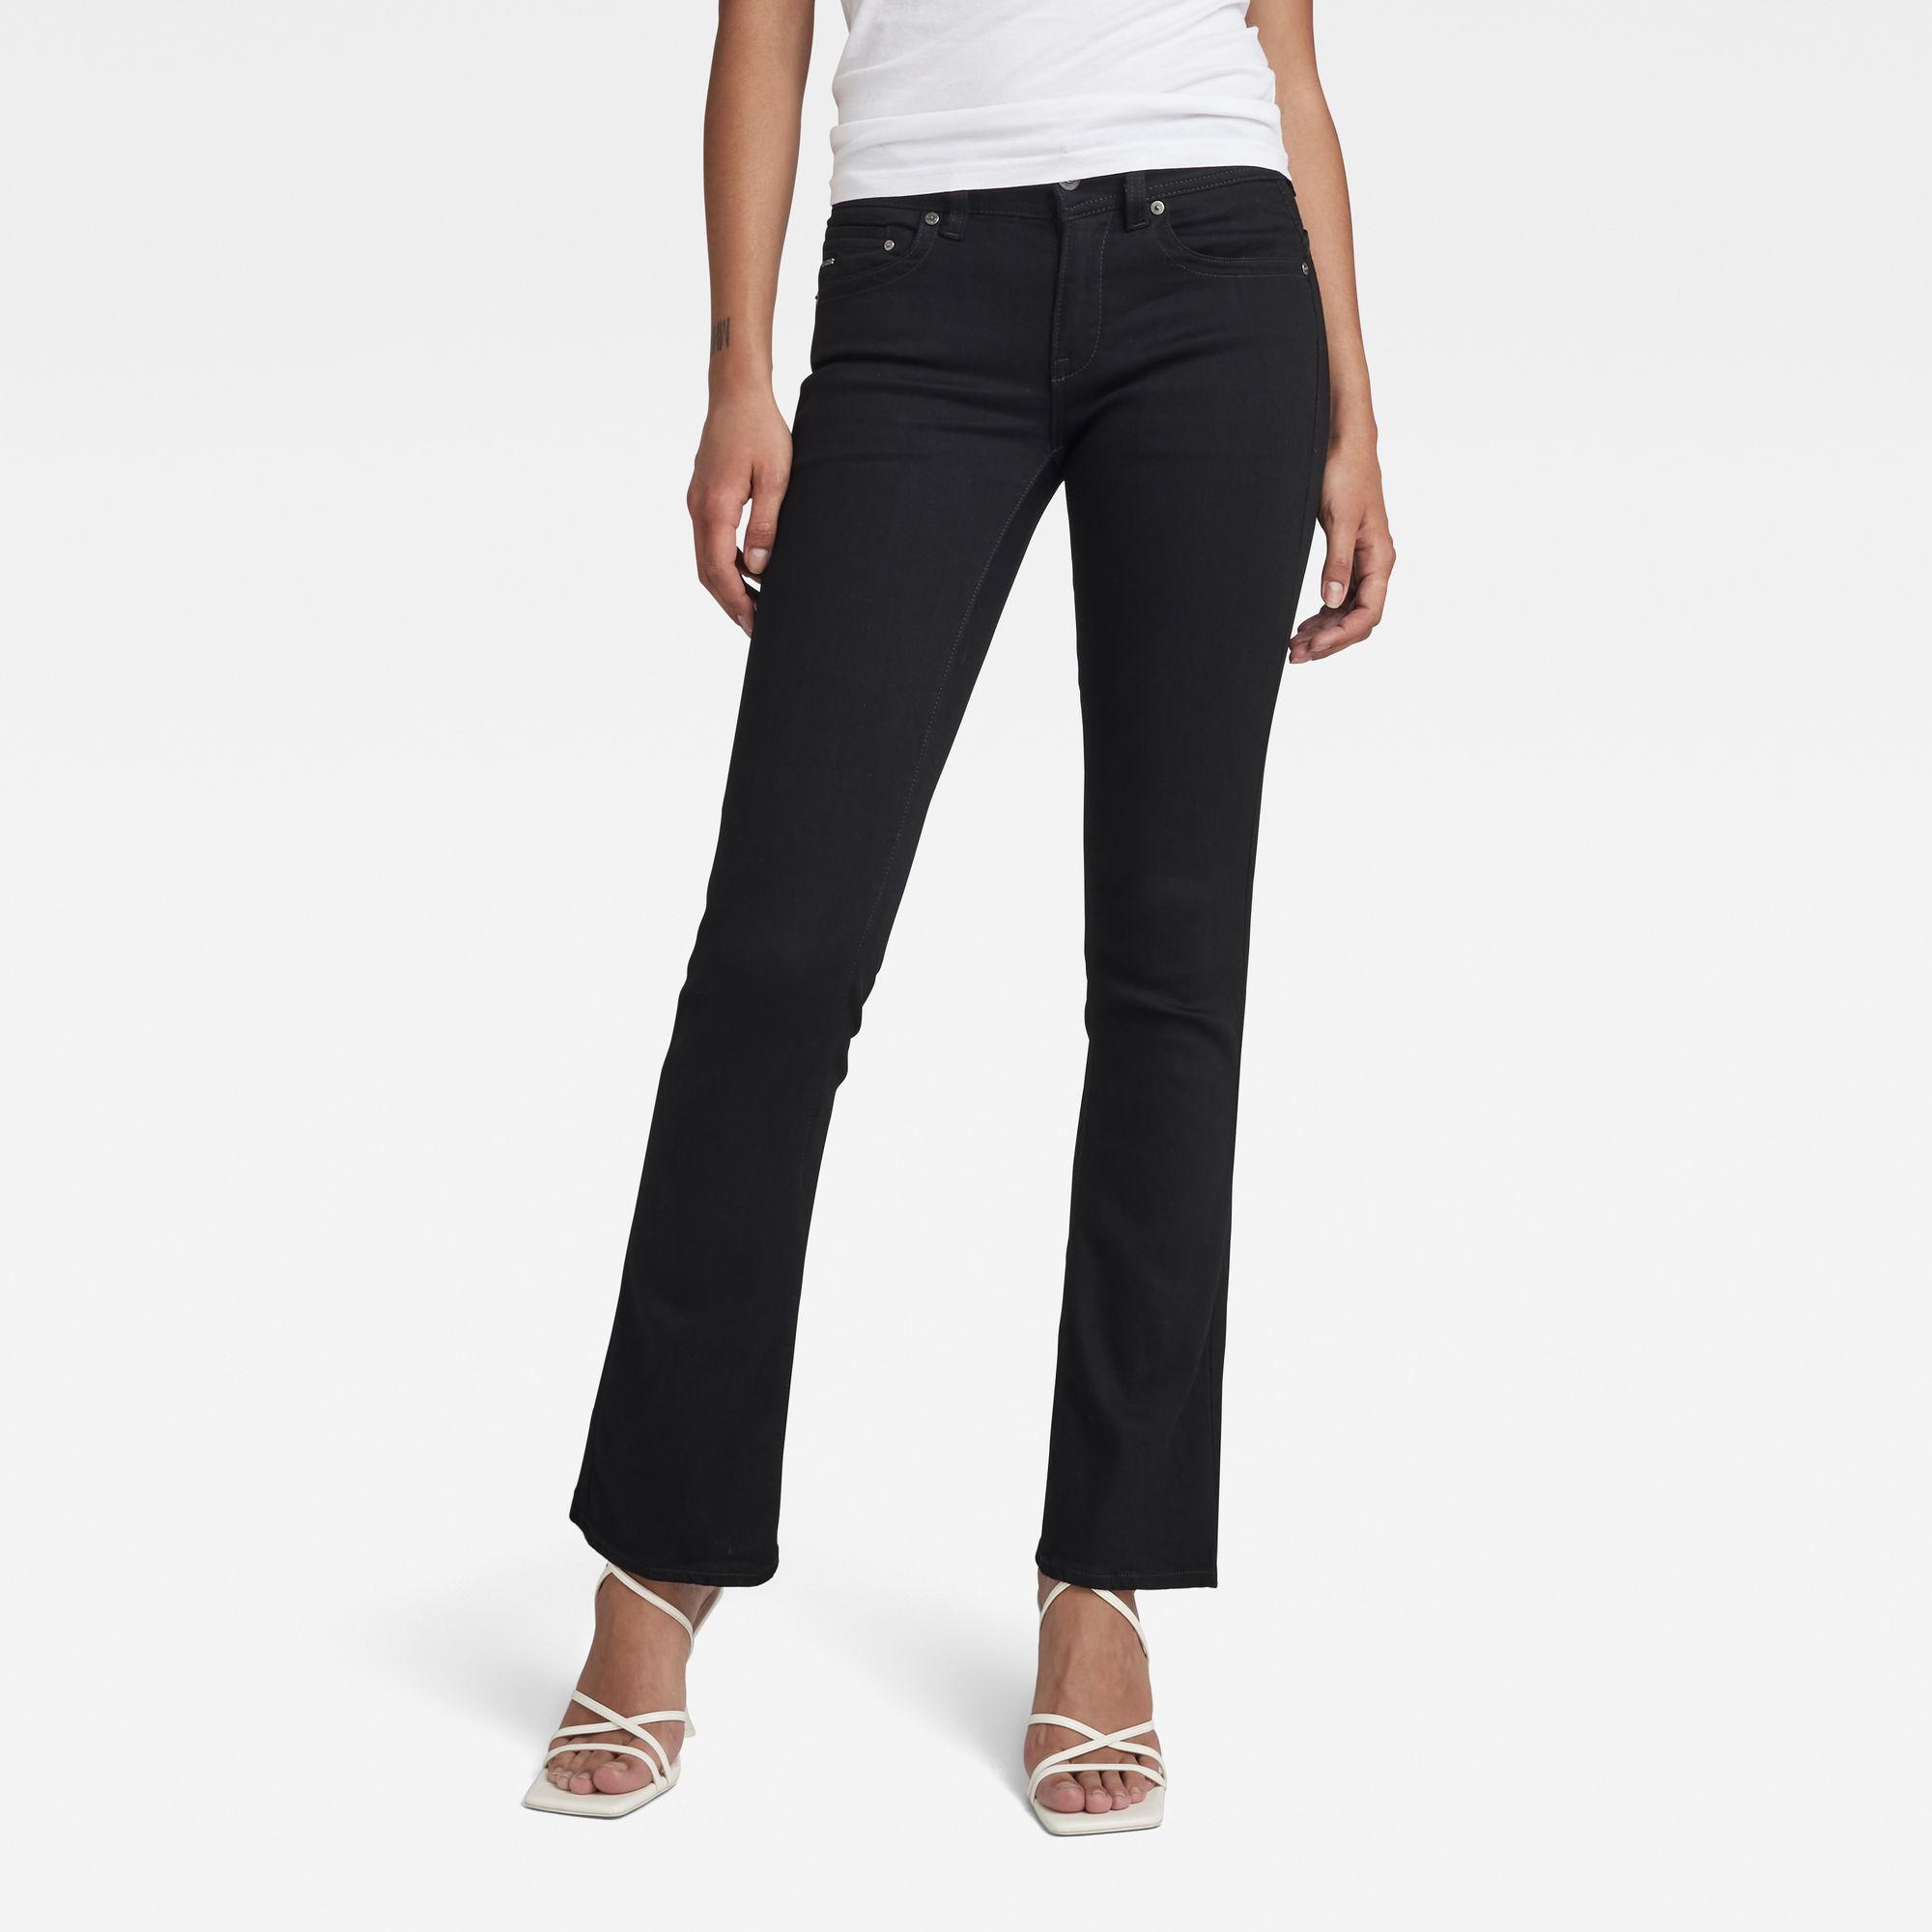 G-Star RAW Dames Midge Bootcut Jeans Donkerblauw